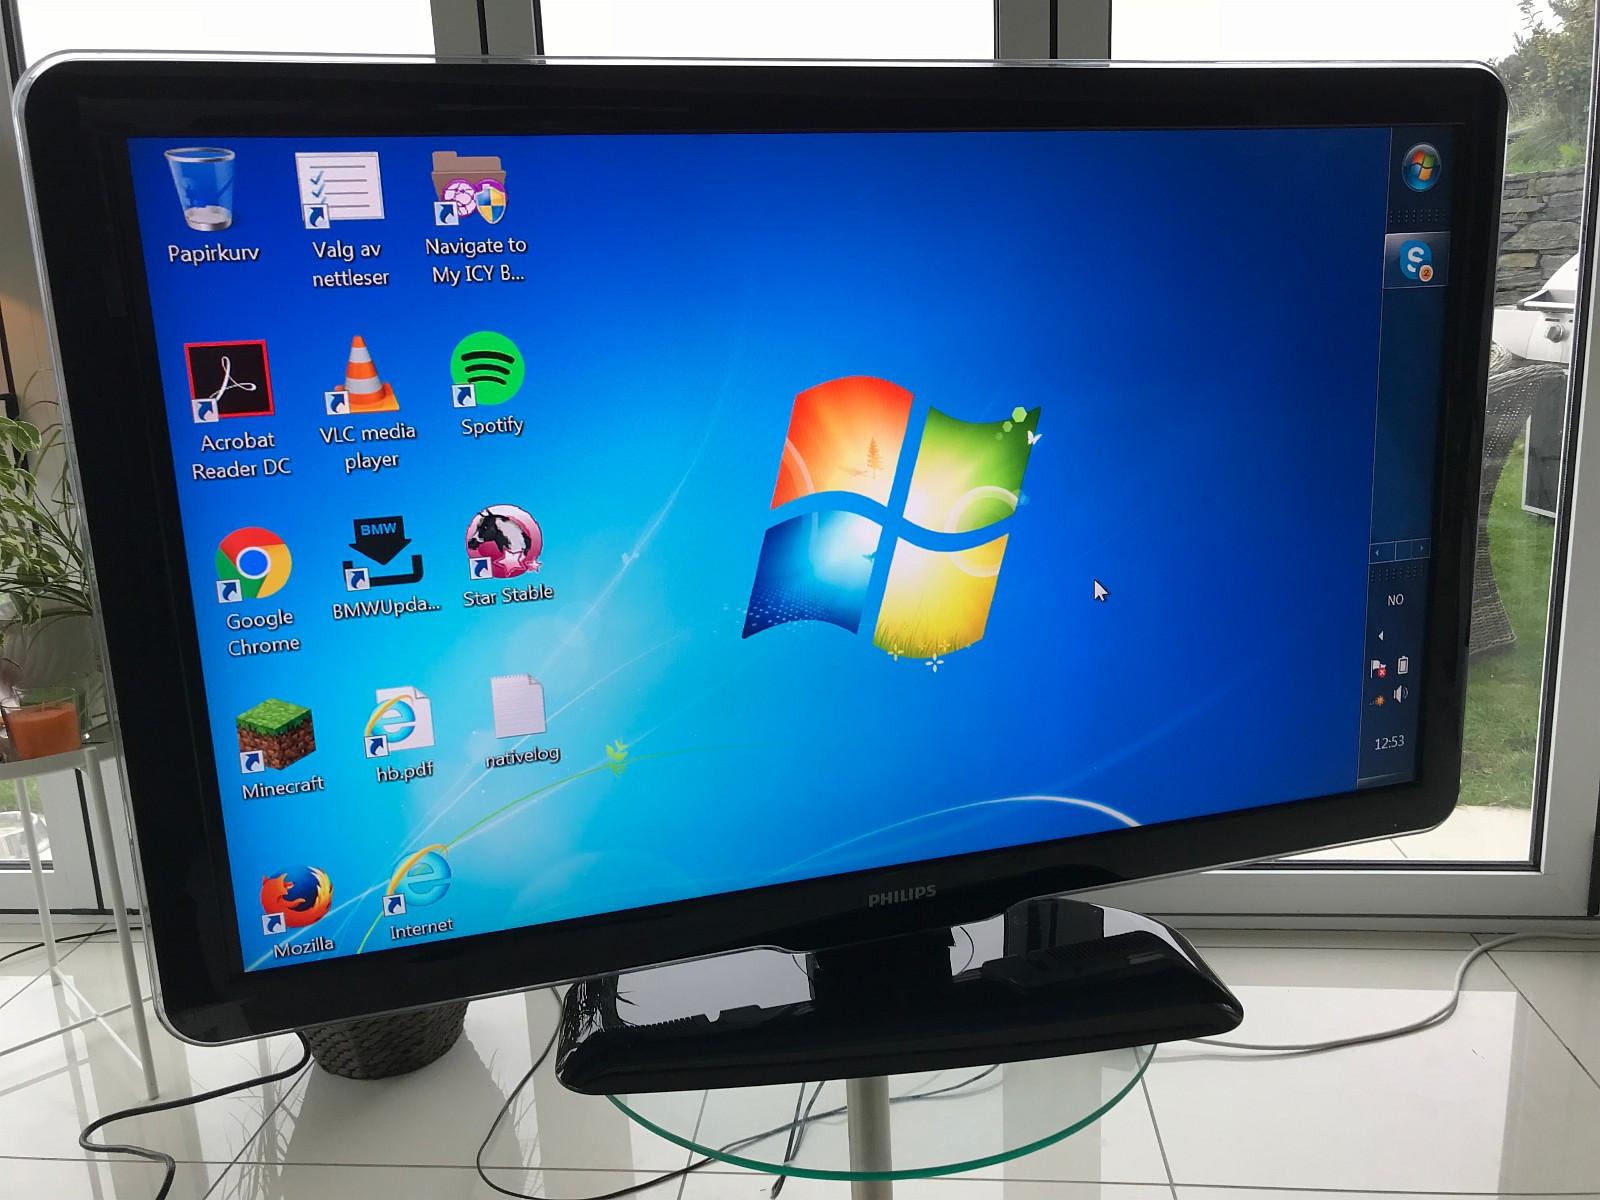 "LCD-TV Philips 47"" - Søgne  - LCD-TV Philips 47"" som ny. https://www.philips.no/c-p/47PFL5604H_12/lcd-tv-med-pixel-plus-hd - Søgne"